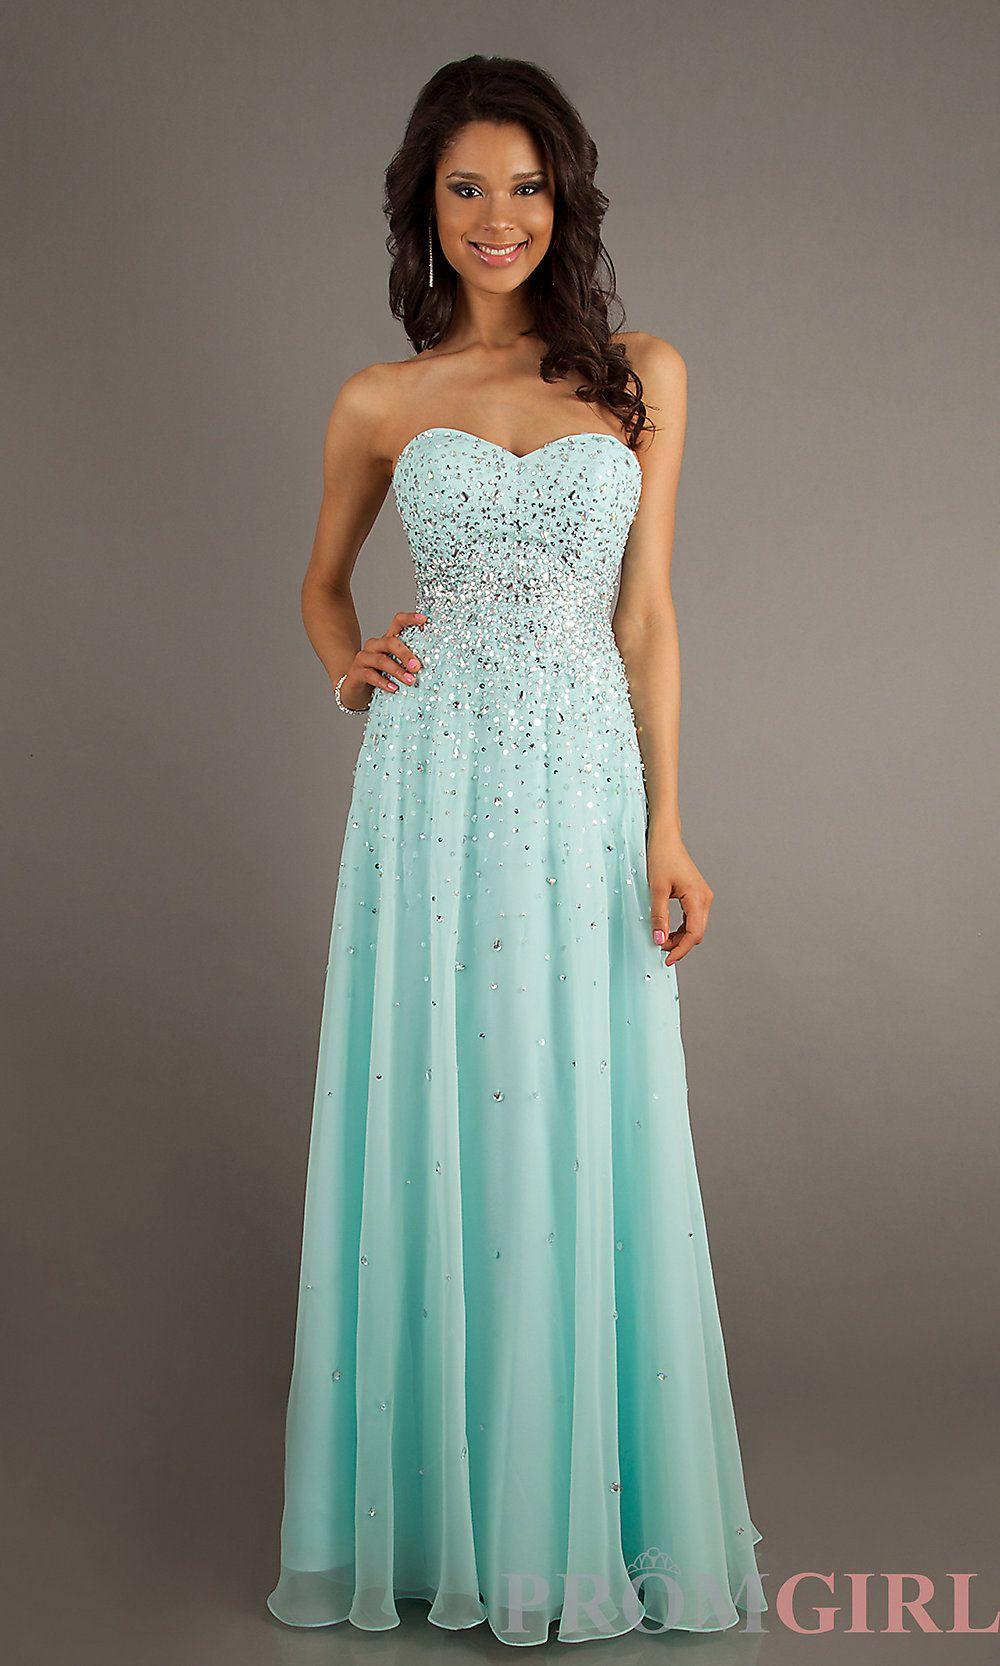 Pin by jenna ferguson on prom dress pinterest prom dresses